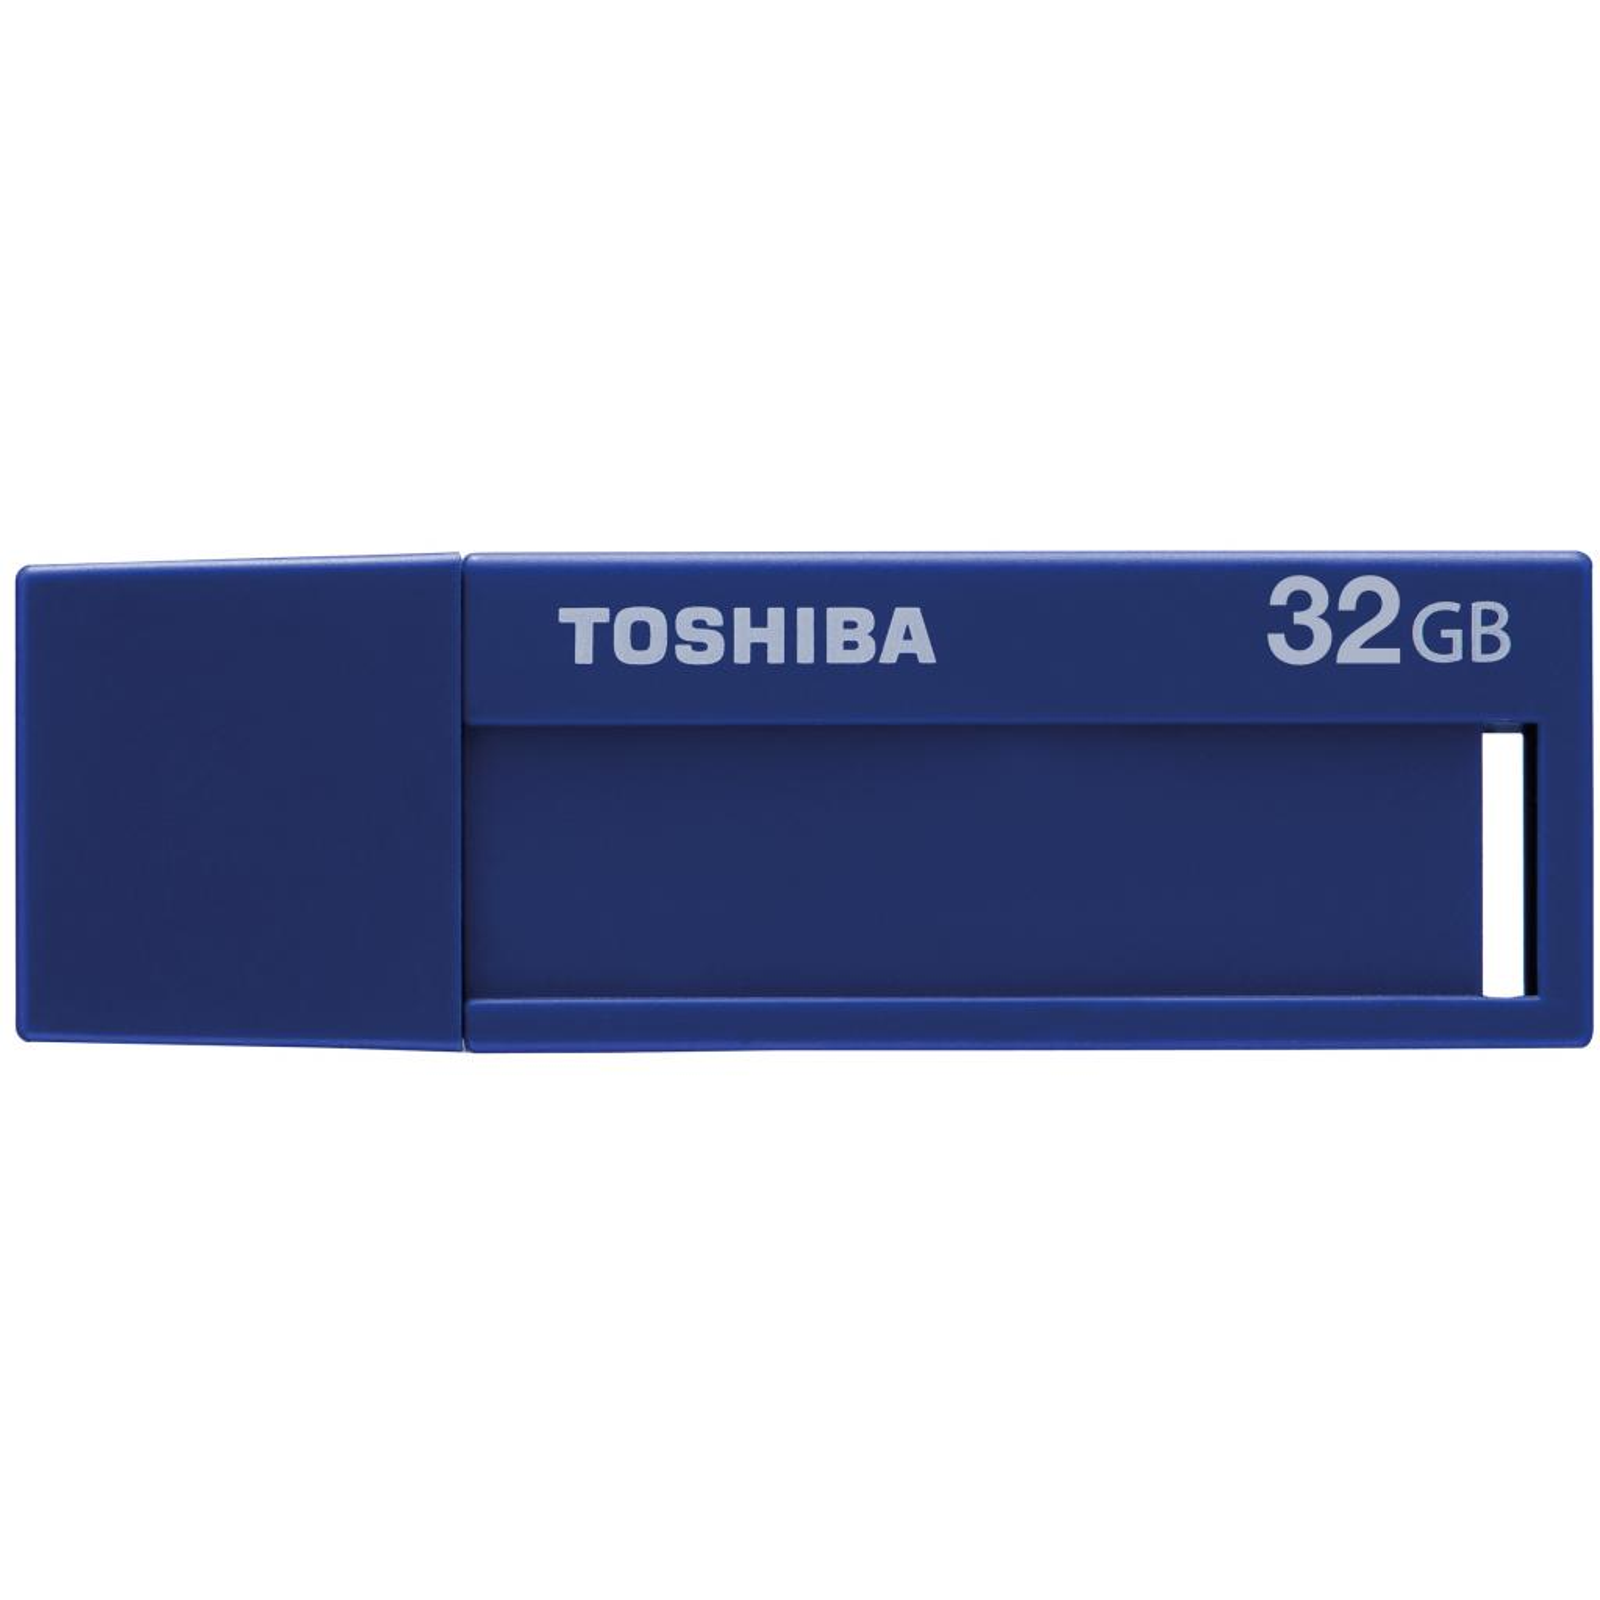 USB флеш накопитель TOSHIBA 32GB Daichi Blue USB 3.0 (THN-U302B0320M4)